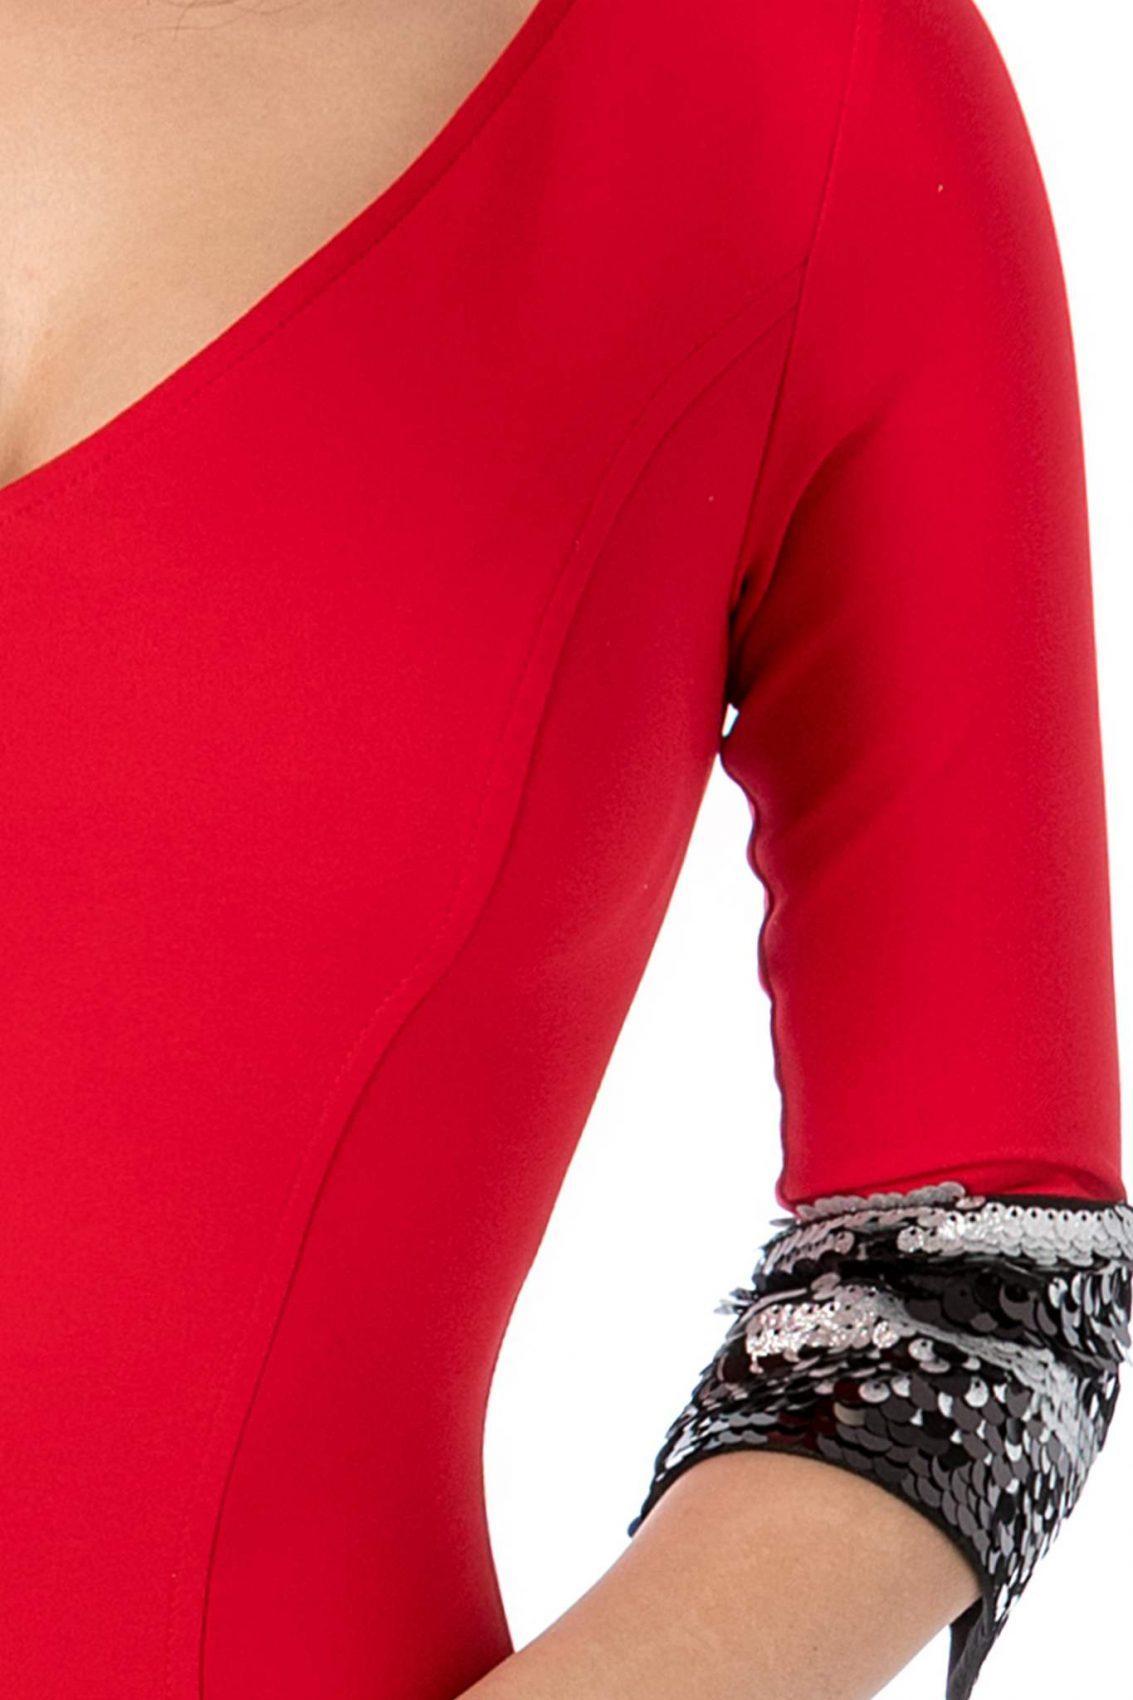 Irma Κόκκινο Φόρεμα 1226